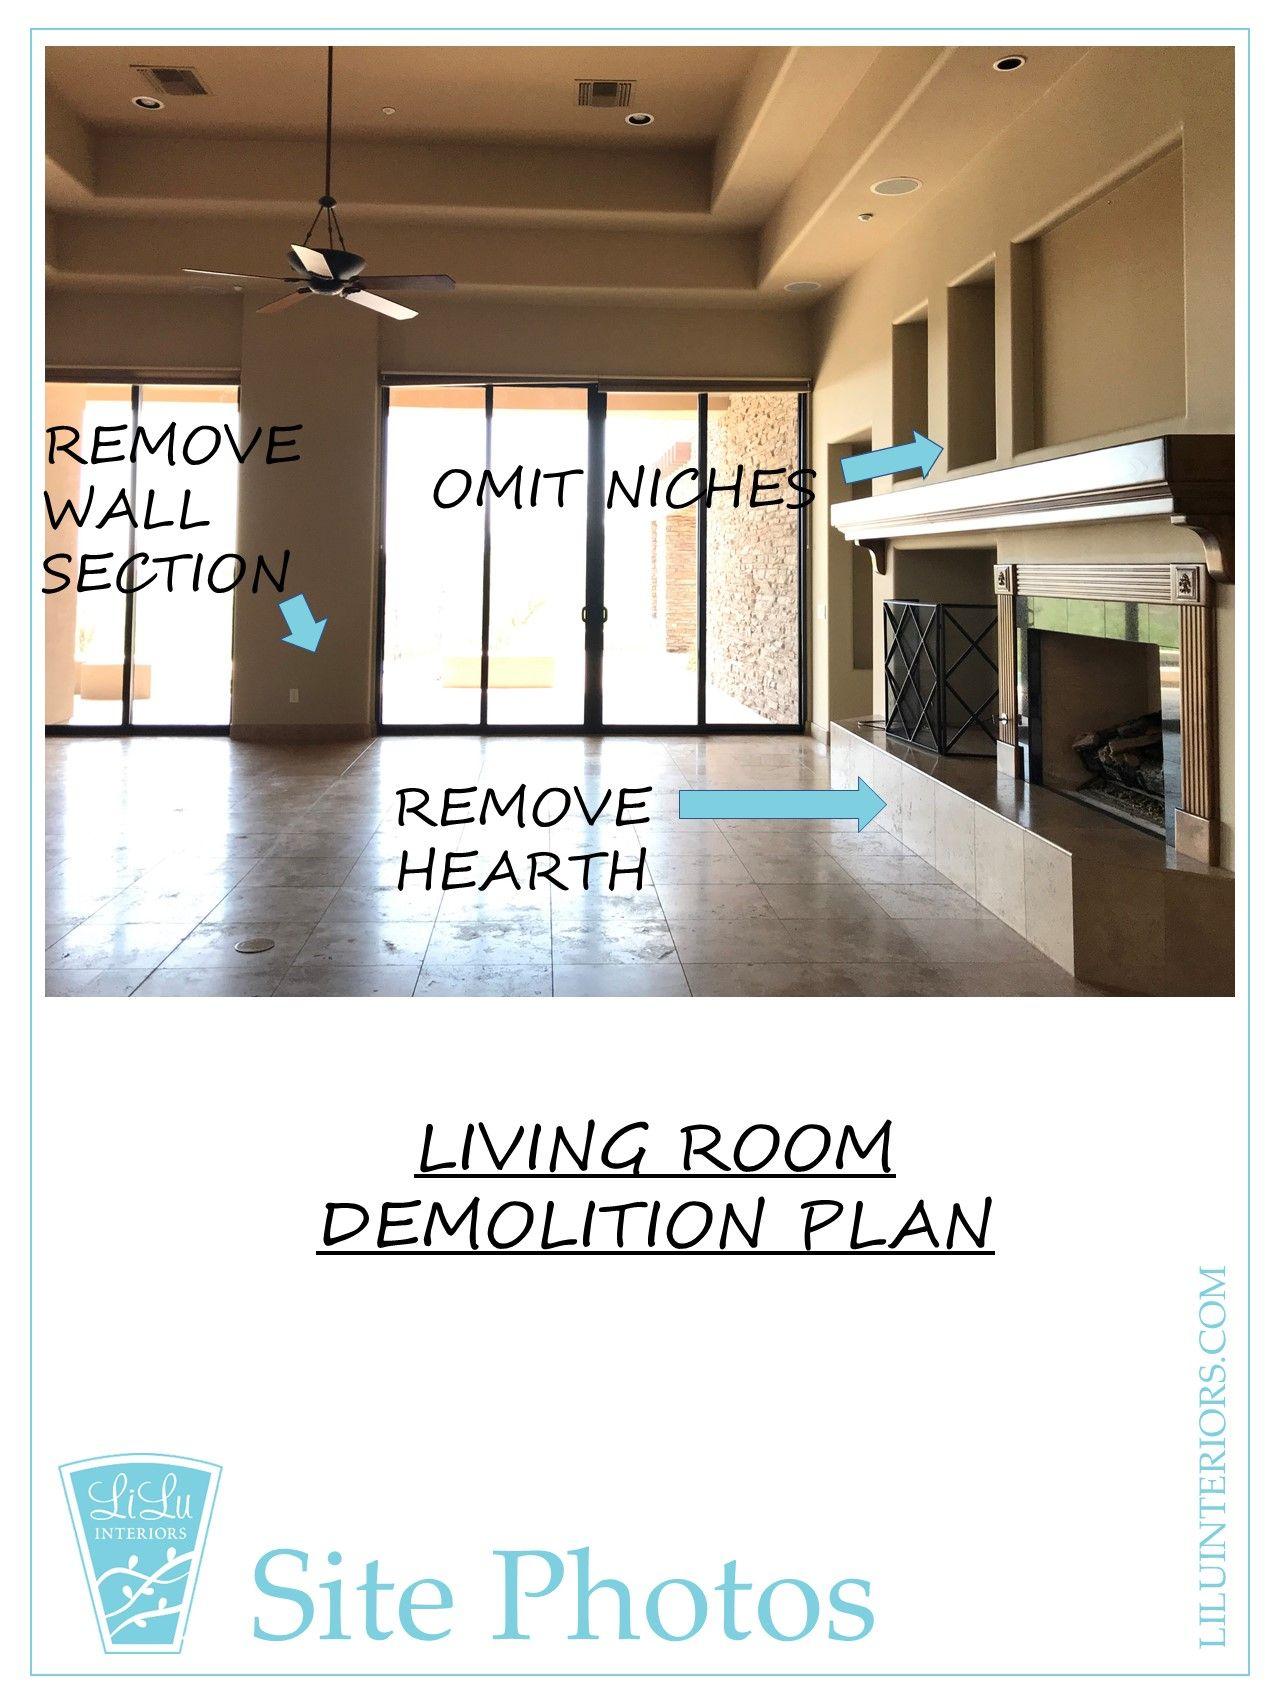 Complete Home Remodel in Arizona by LiLu #remodel #designadvice #contemporary #interiordesign #interiordesignideas #homedesign #interiordecor #homedesignideas #interiorinspiration #homedecor #sitevisit #customdesign #customhome #homeremodel #minneapolis #design